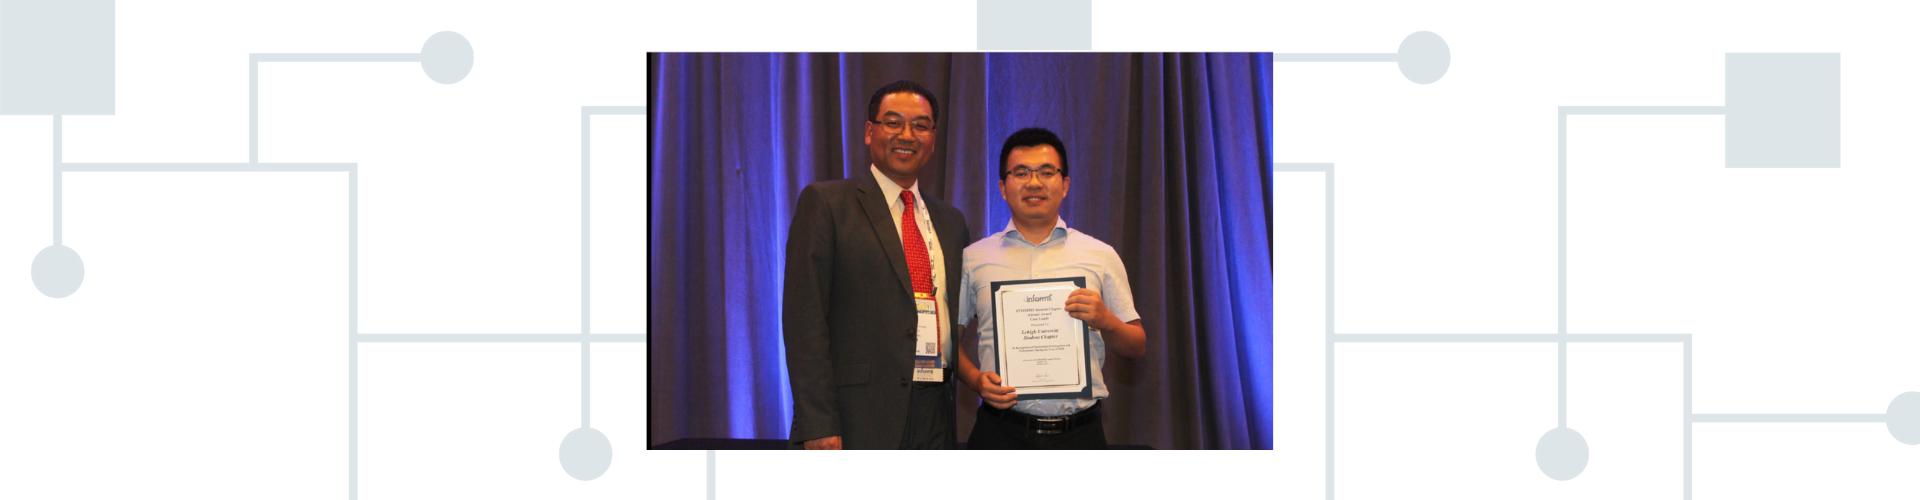 INFORMS award